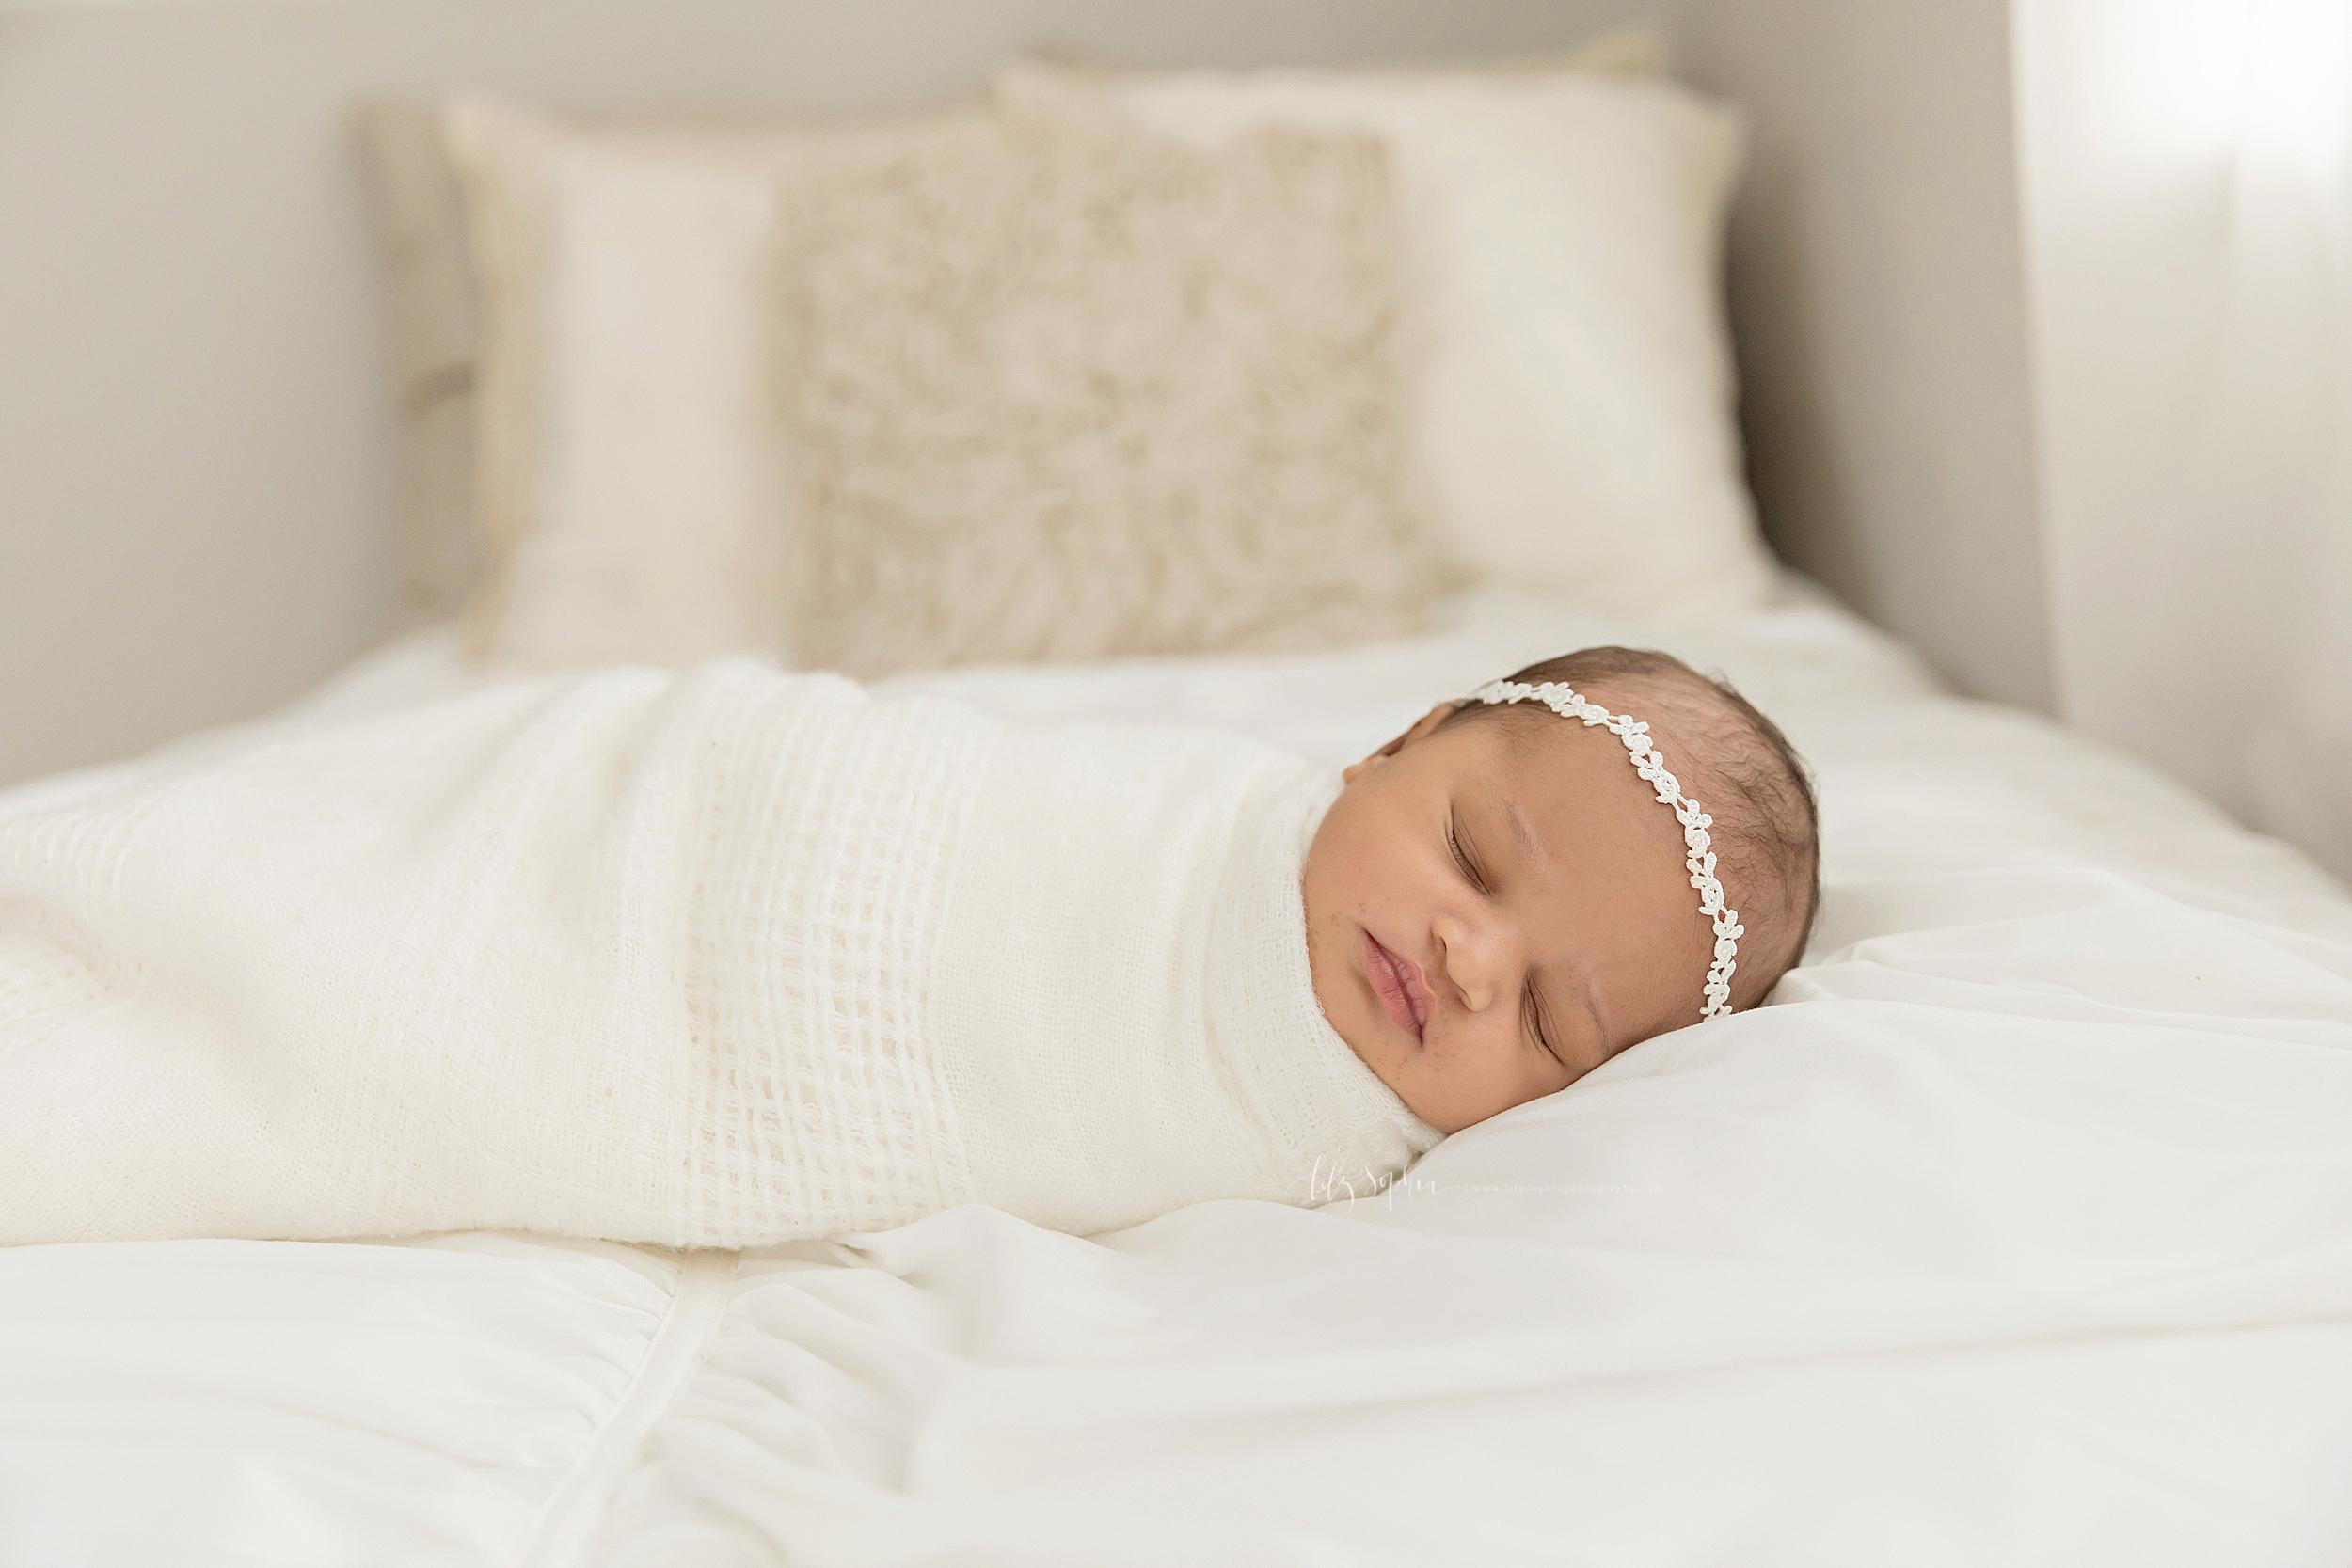 atlanta-midtown-brookhaven-decatur-lily-sophia-photography-photographer-portraits-grant-park-family-studio-newborn-baby-girl-big-brothers_0100.jpg